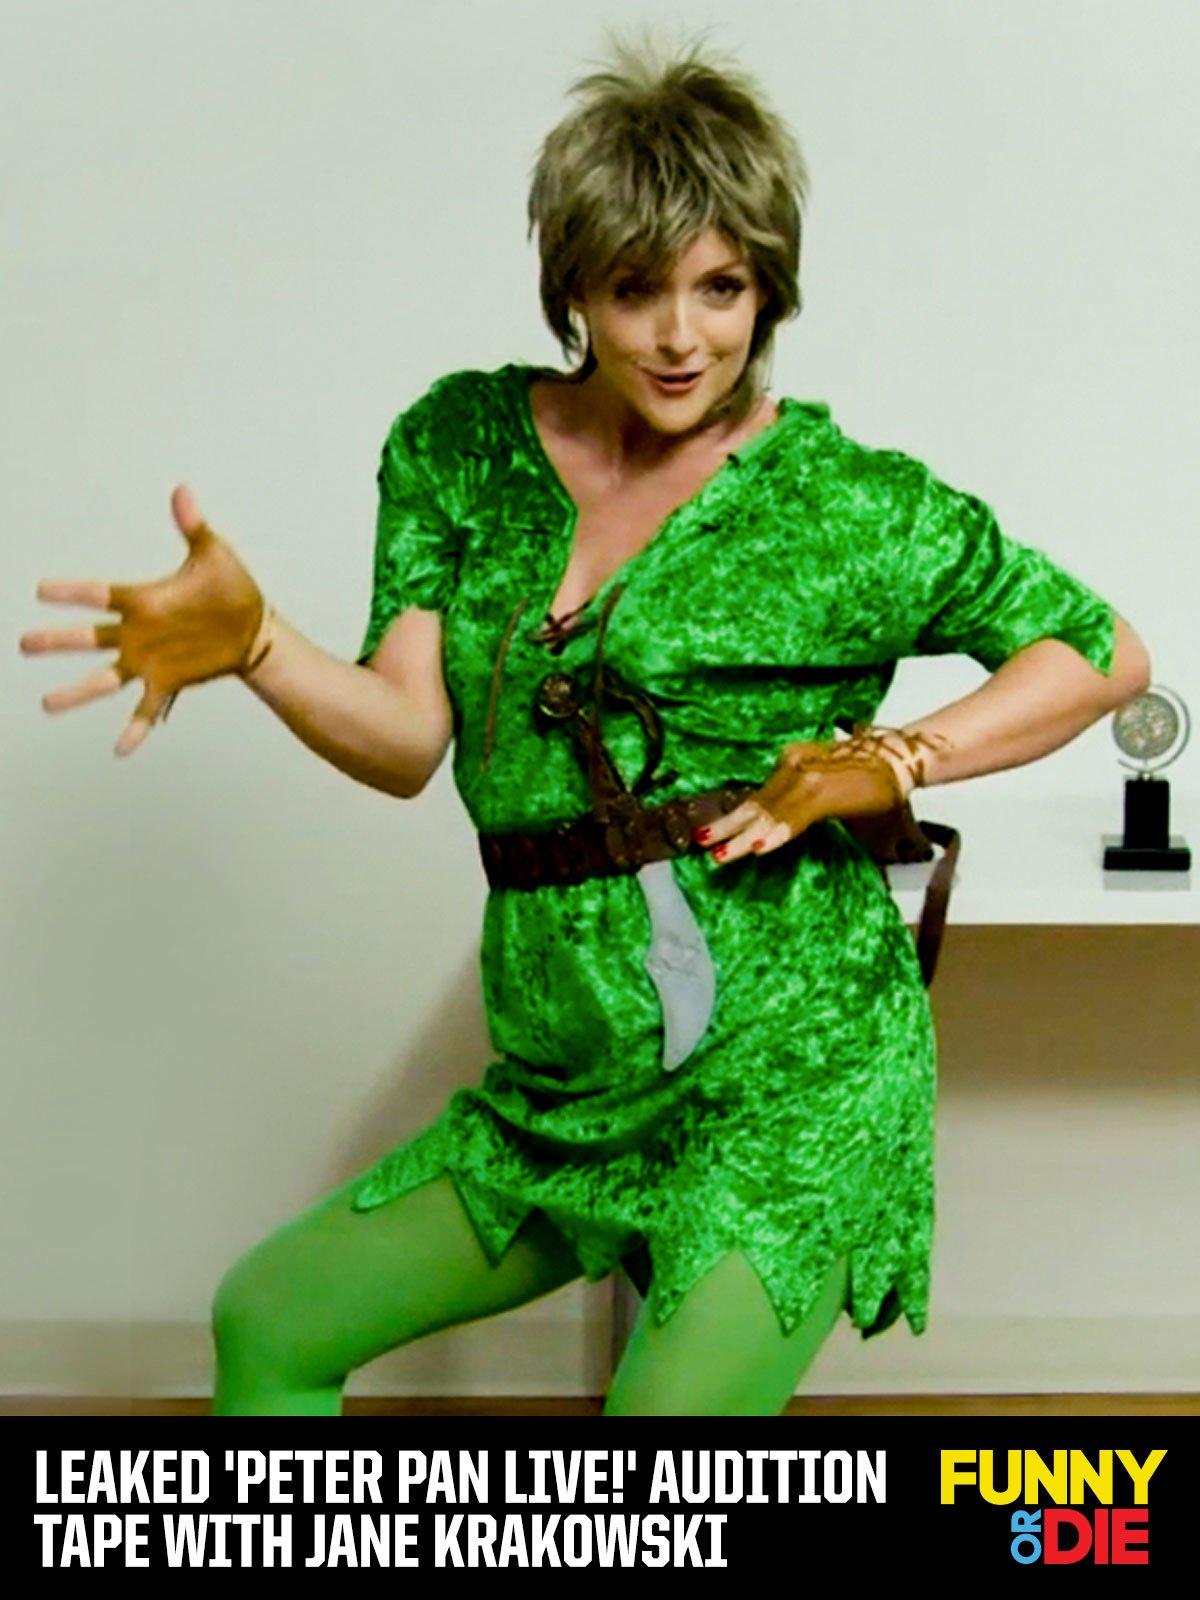 Leaked 'Peter Pan Live!' Audition Tape with Jane Krakowski